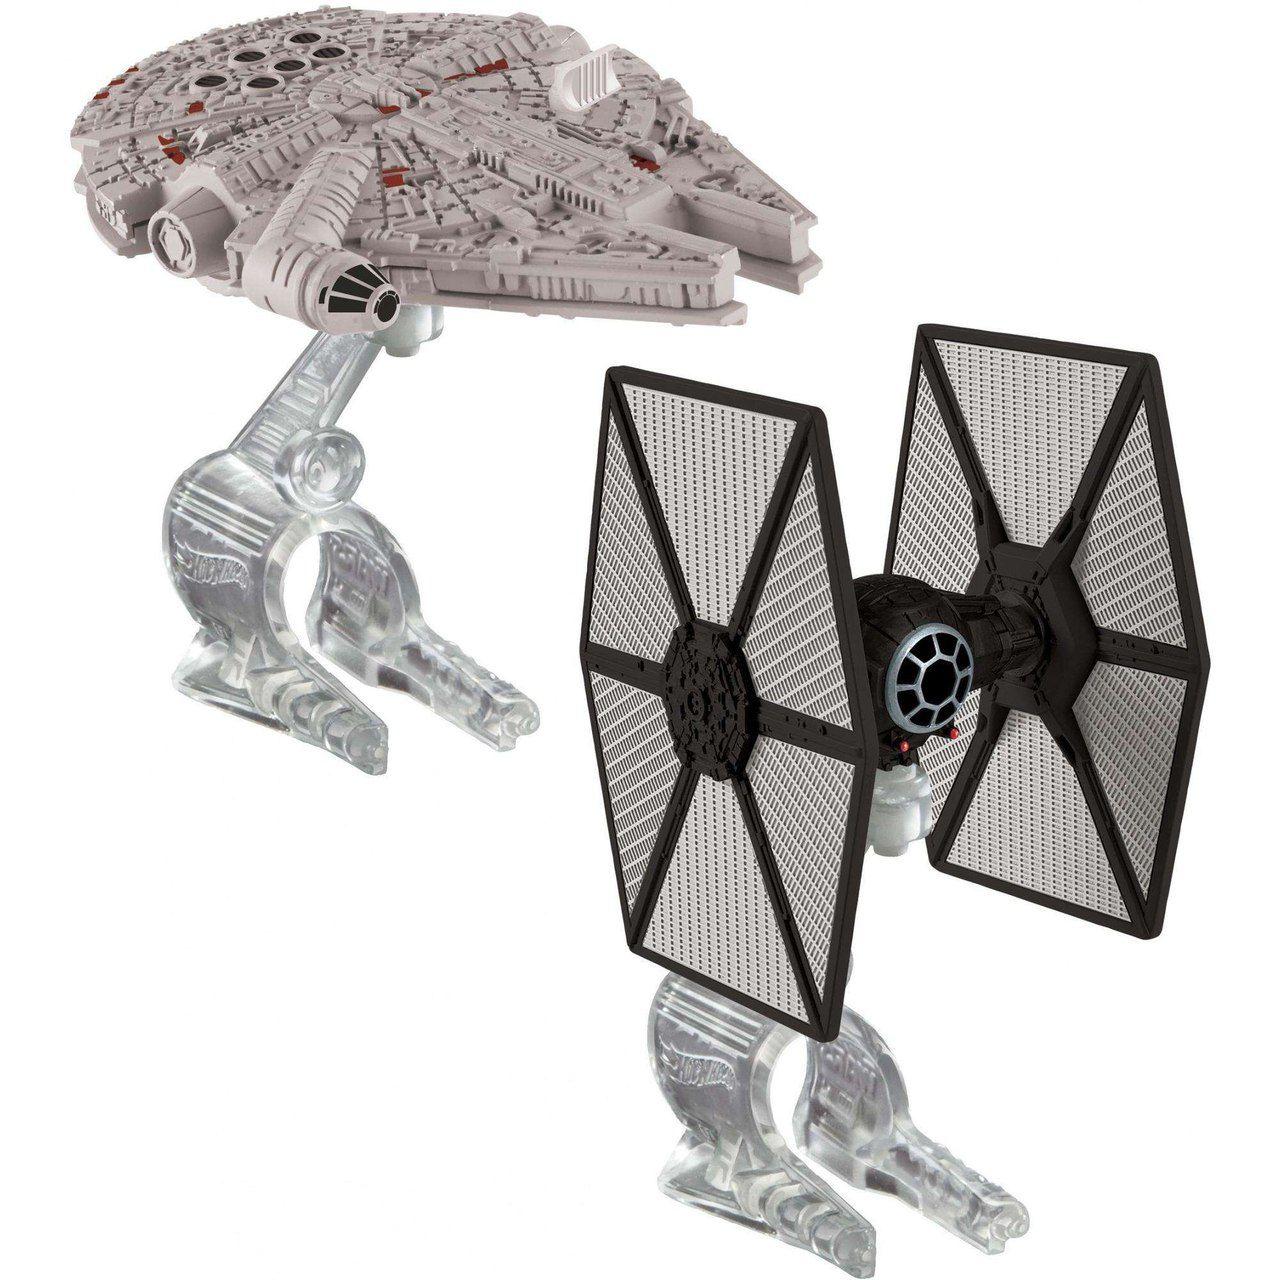 Hot Wheels First Order Tie Fighter vs. Millennium Falcon: Star Wars - Mattel